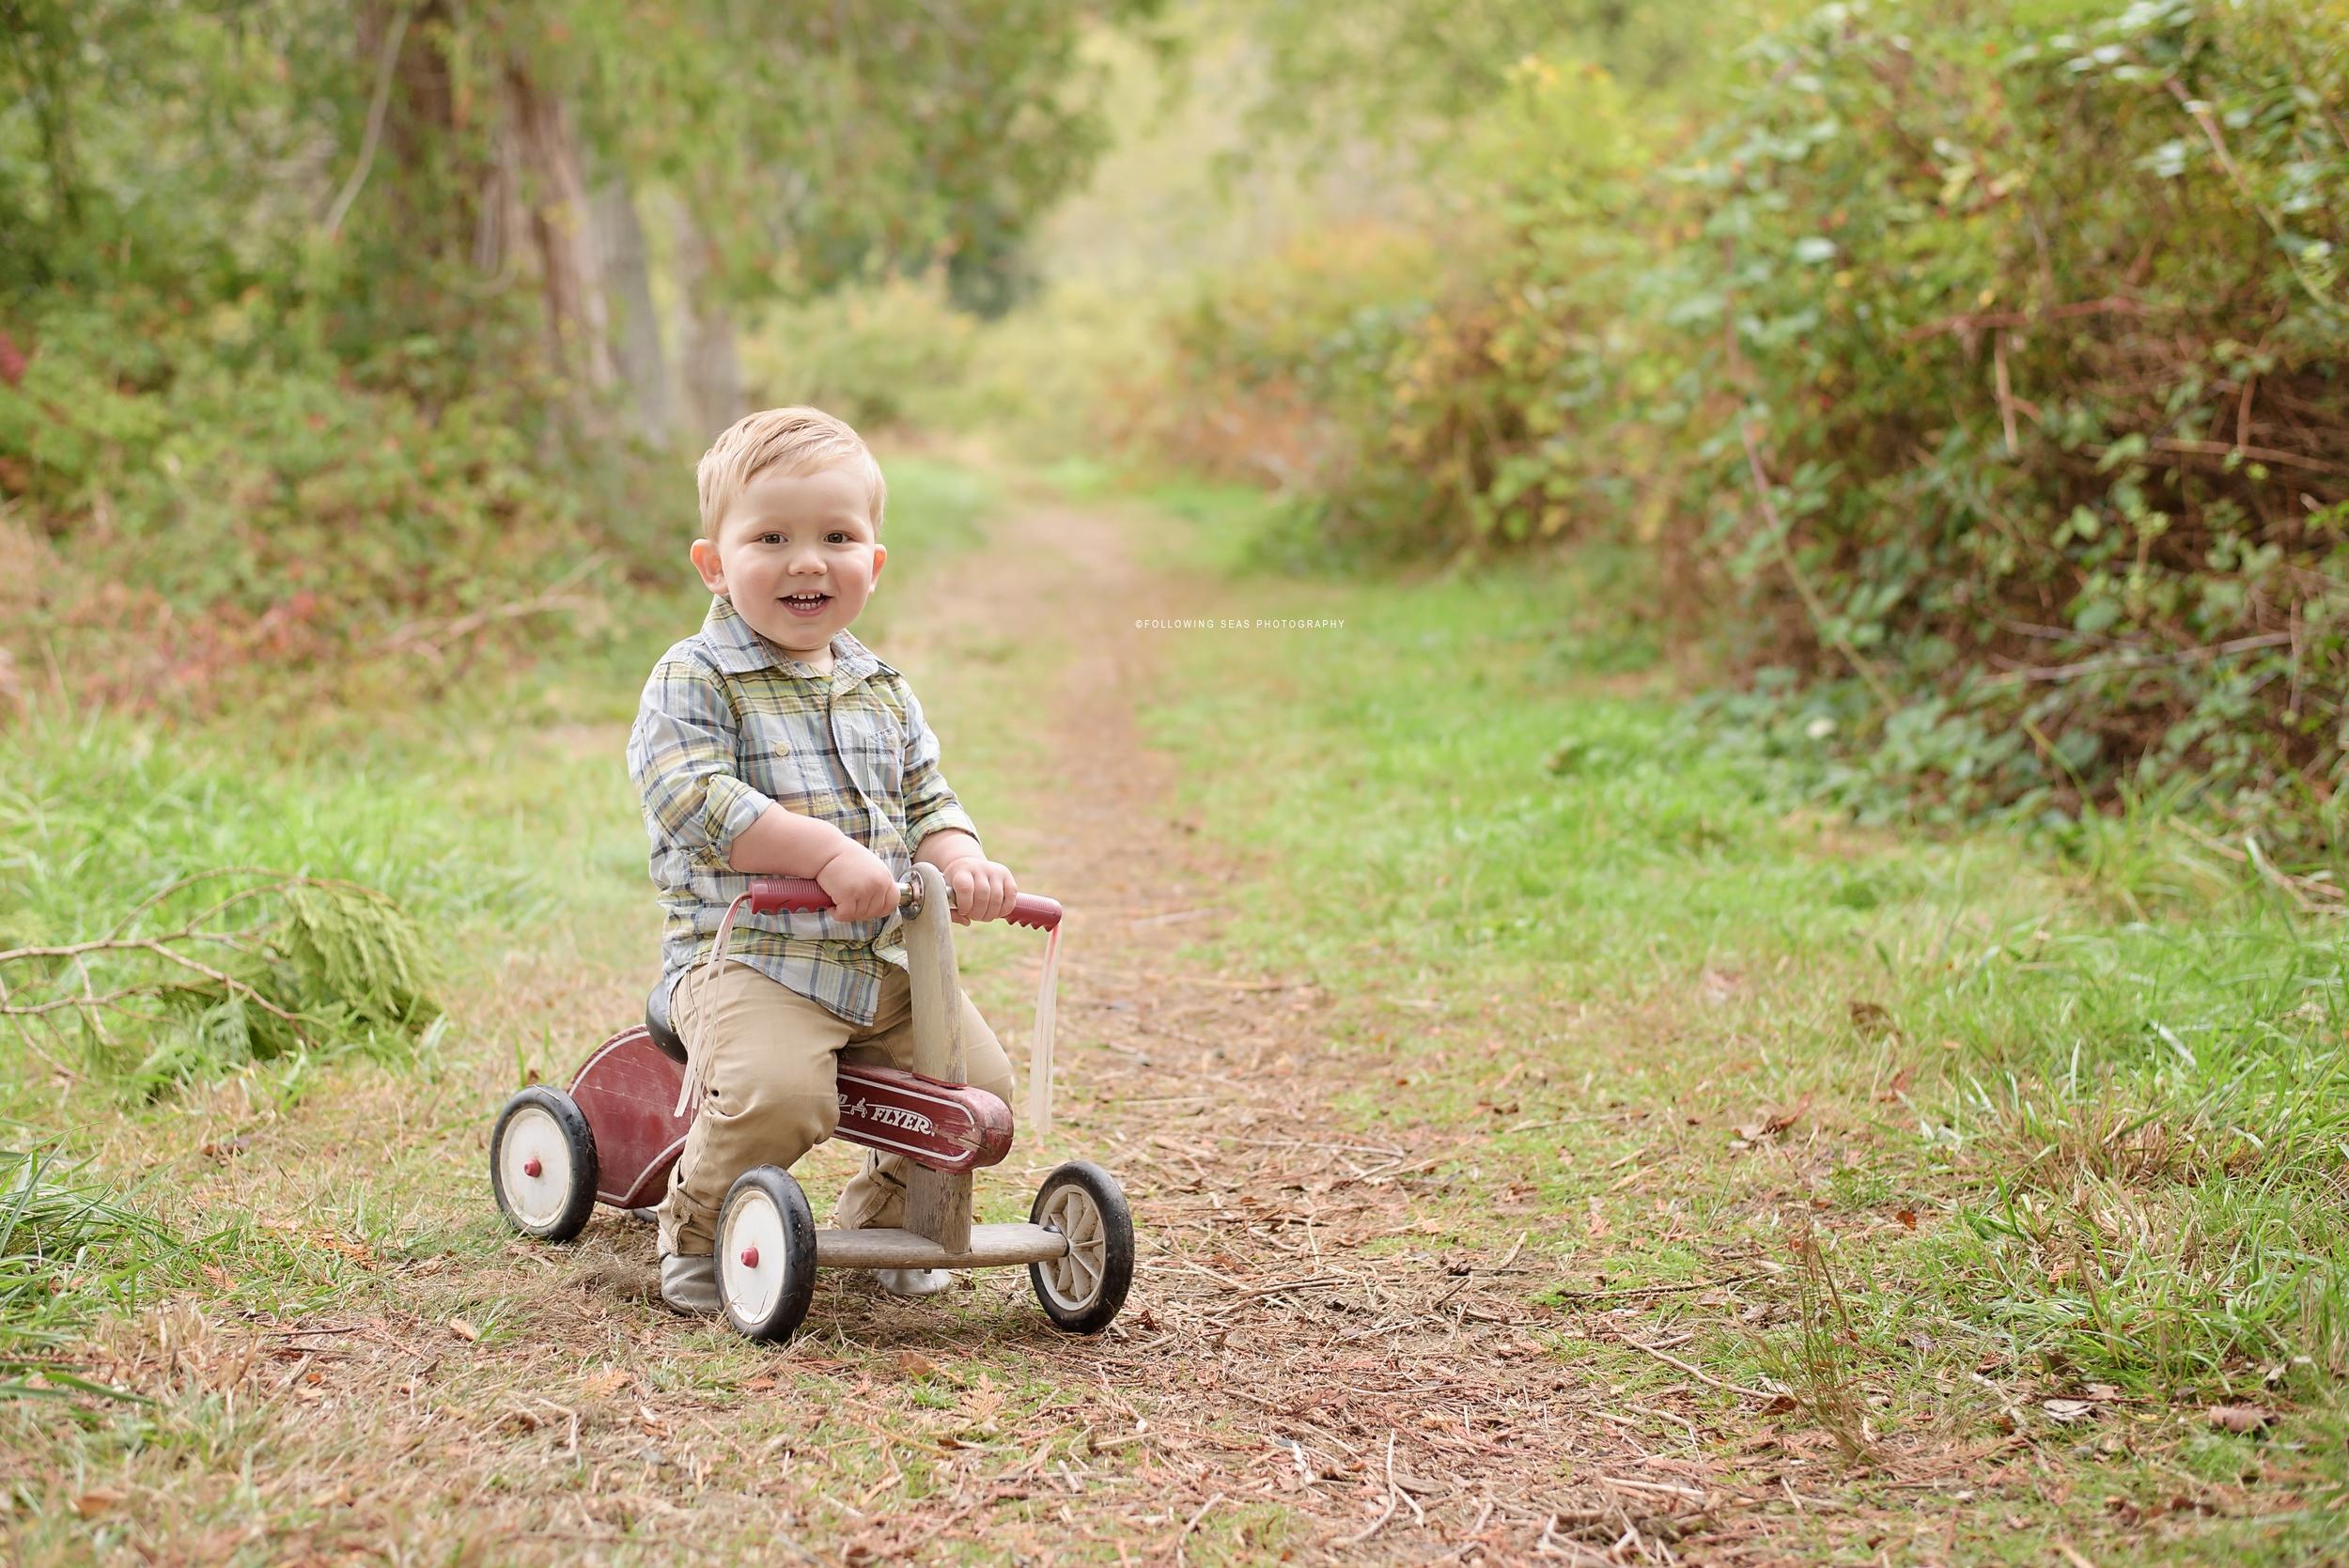 Silverdale-Child-Photographer-Following-Seas-Photography-8025 copy.jpg